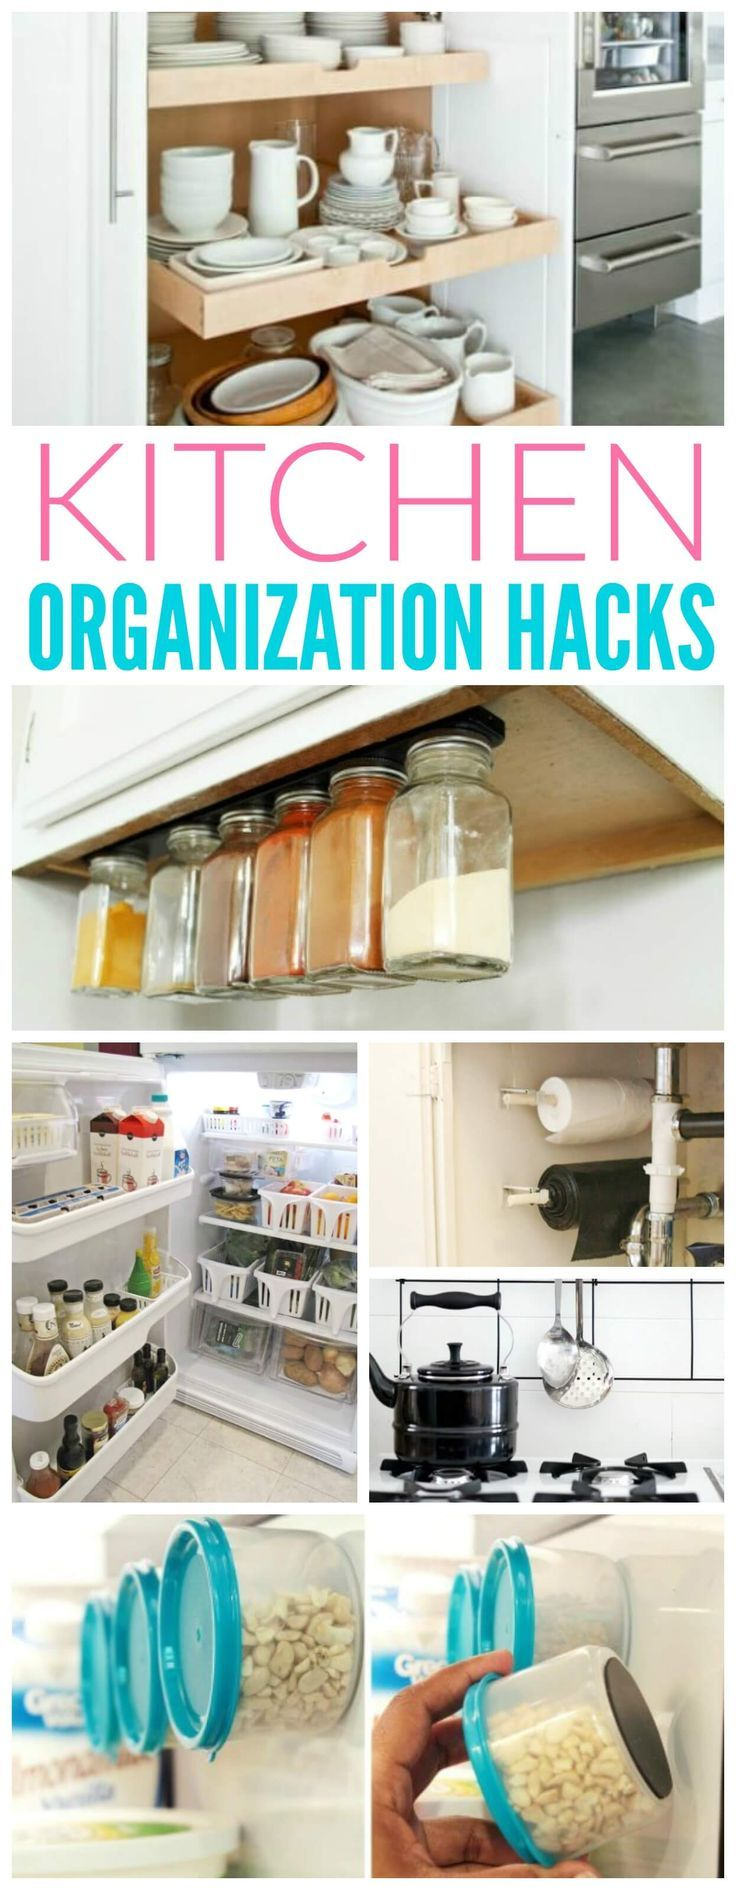 kitchen organization hacks diy tips for spring cleaning and getting organiz kitchen hacks on kitchen organization diy id=74347